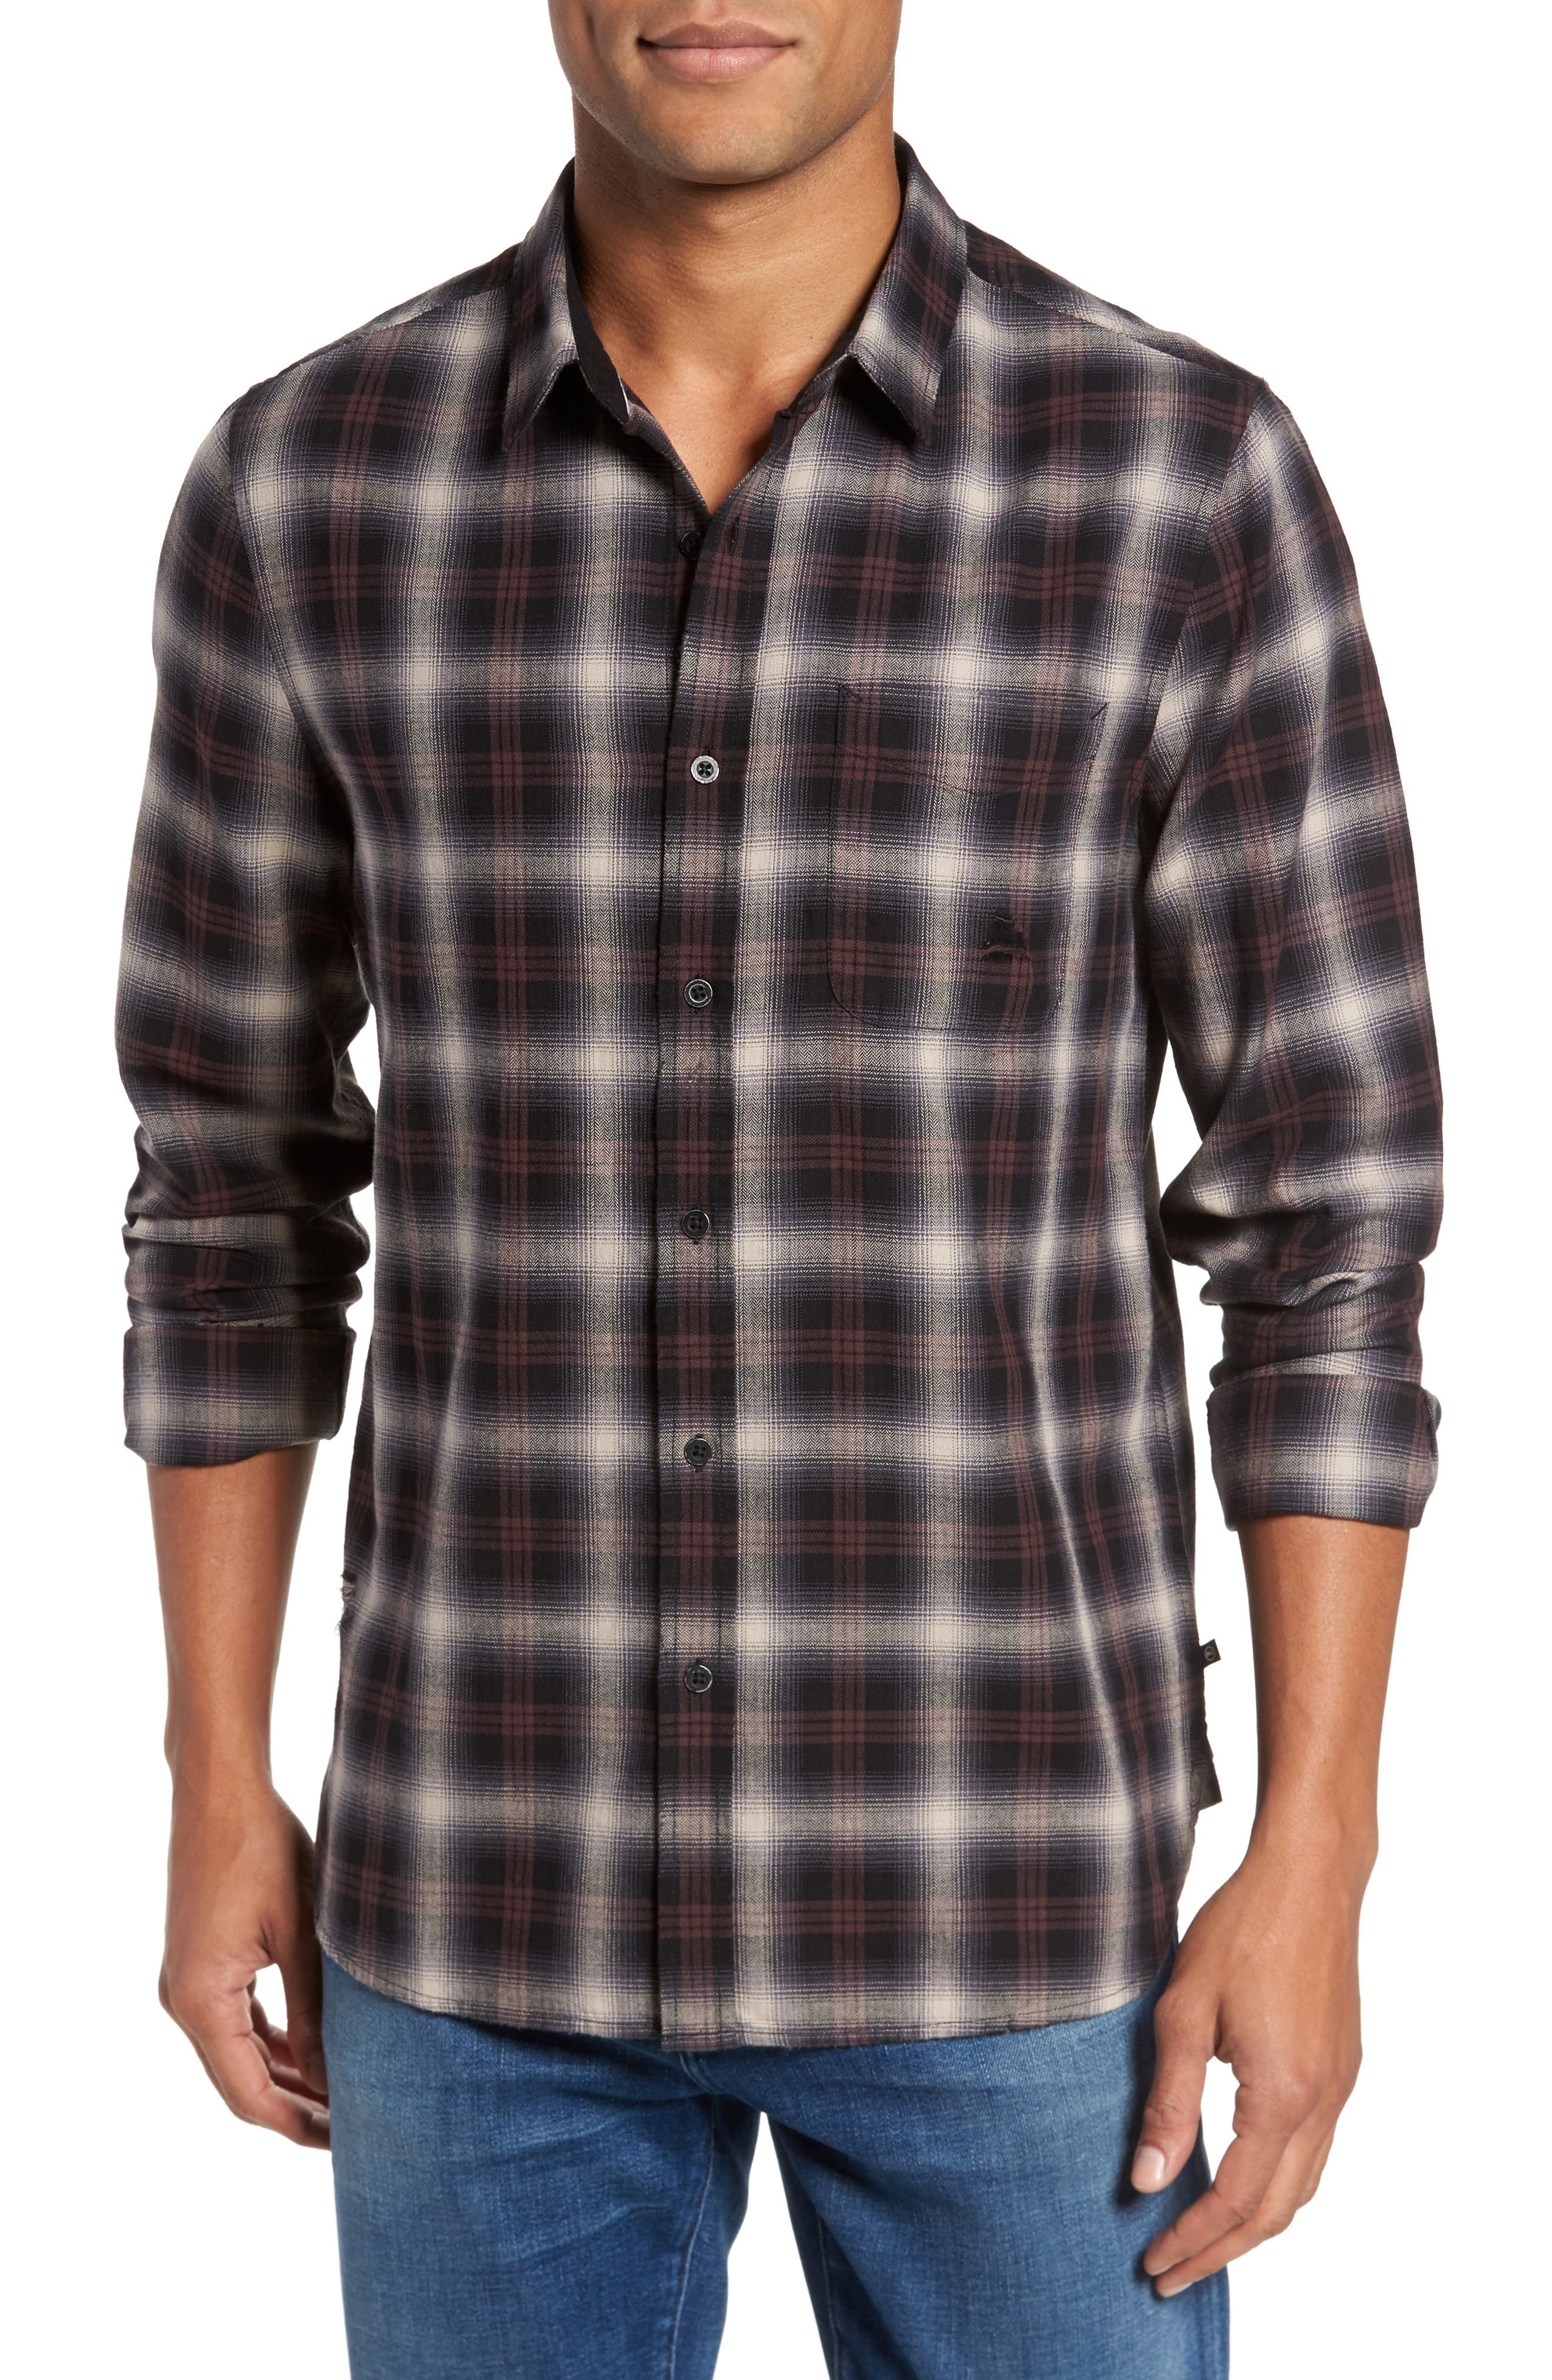 Colton Slim Fit Plaid Sport Shirt,                             Main thumbnail 1, color,                             7 Years Beige/ Deep Mahogany